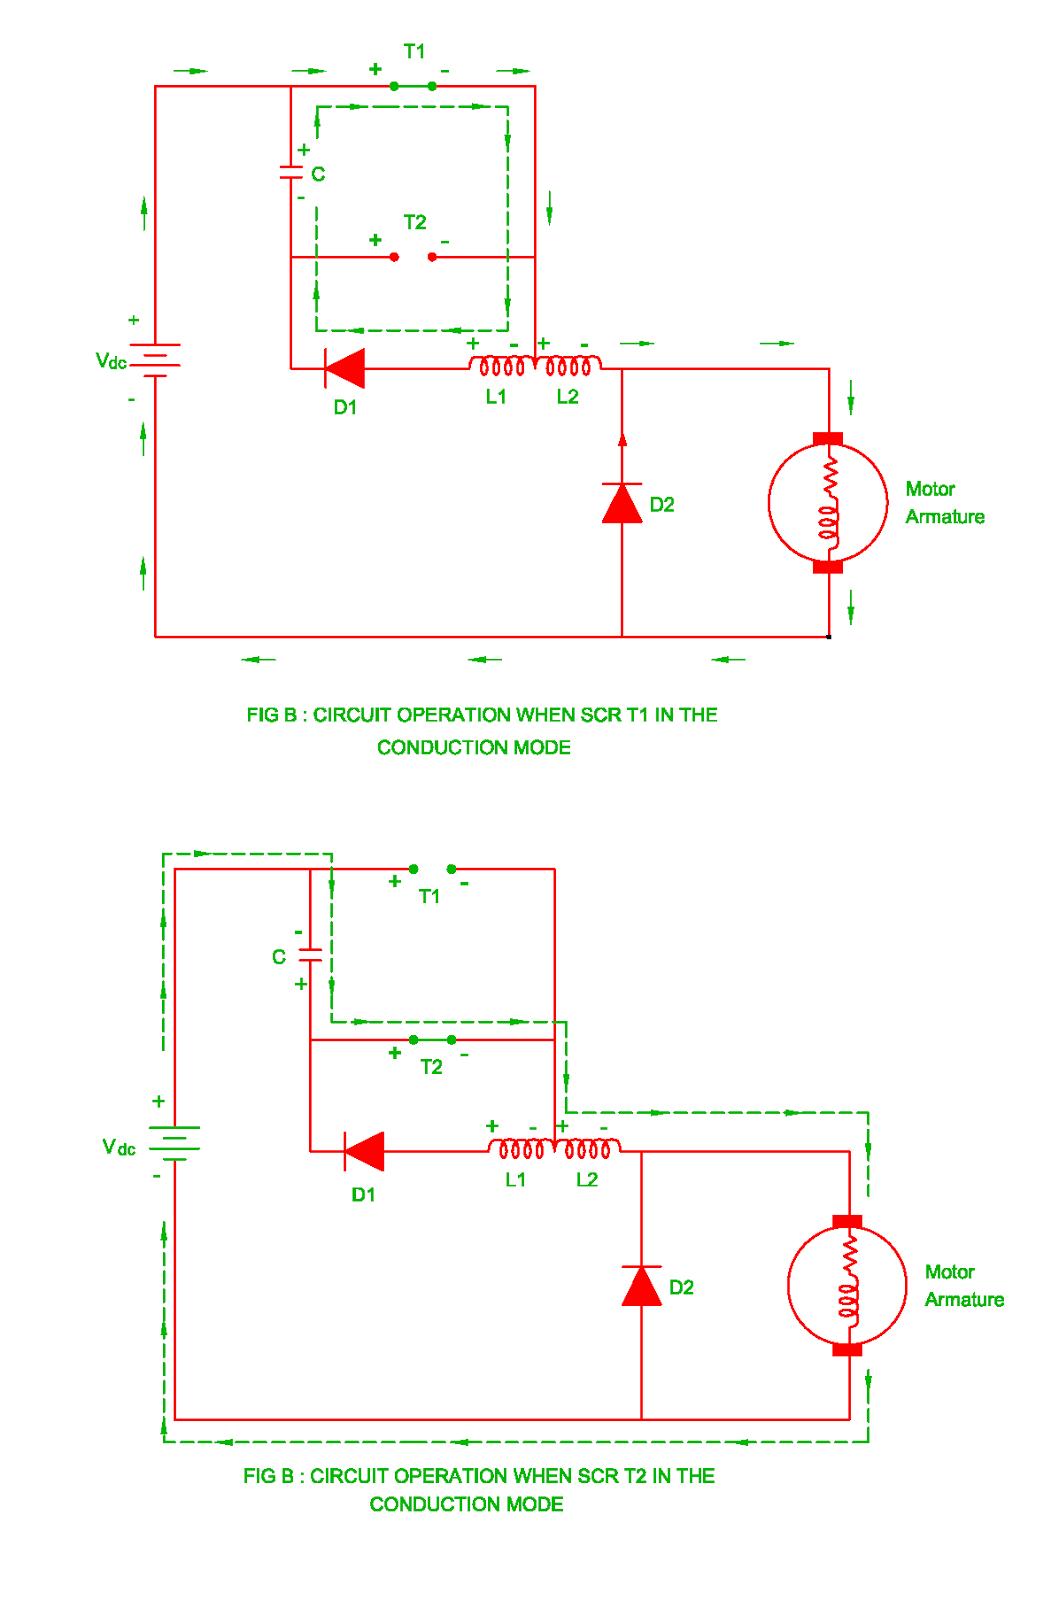 hight resolution of jones chopper electrical revolution v rod diagram circuit diagram jones chopper